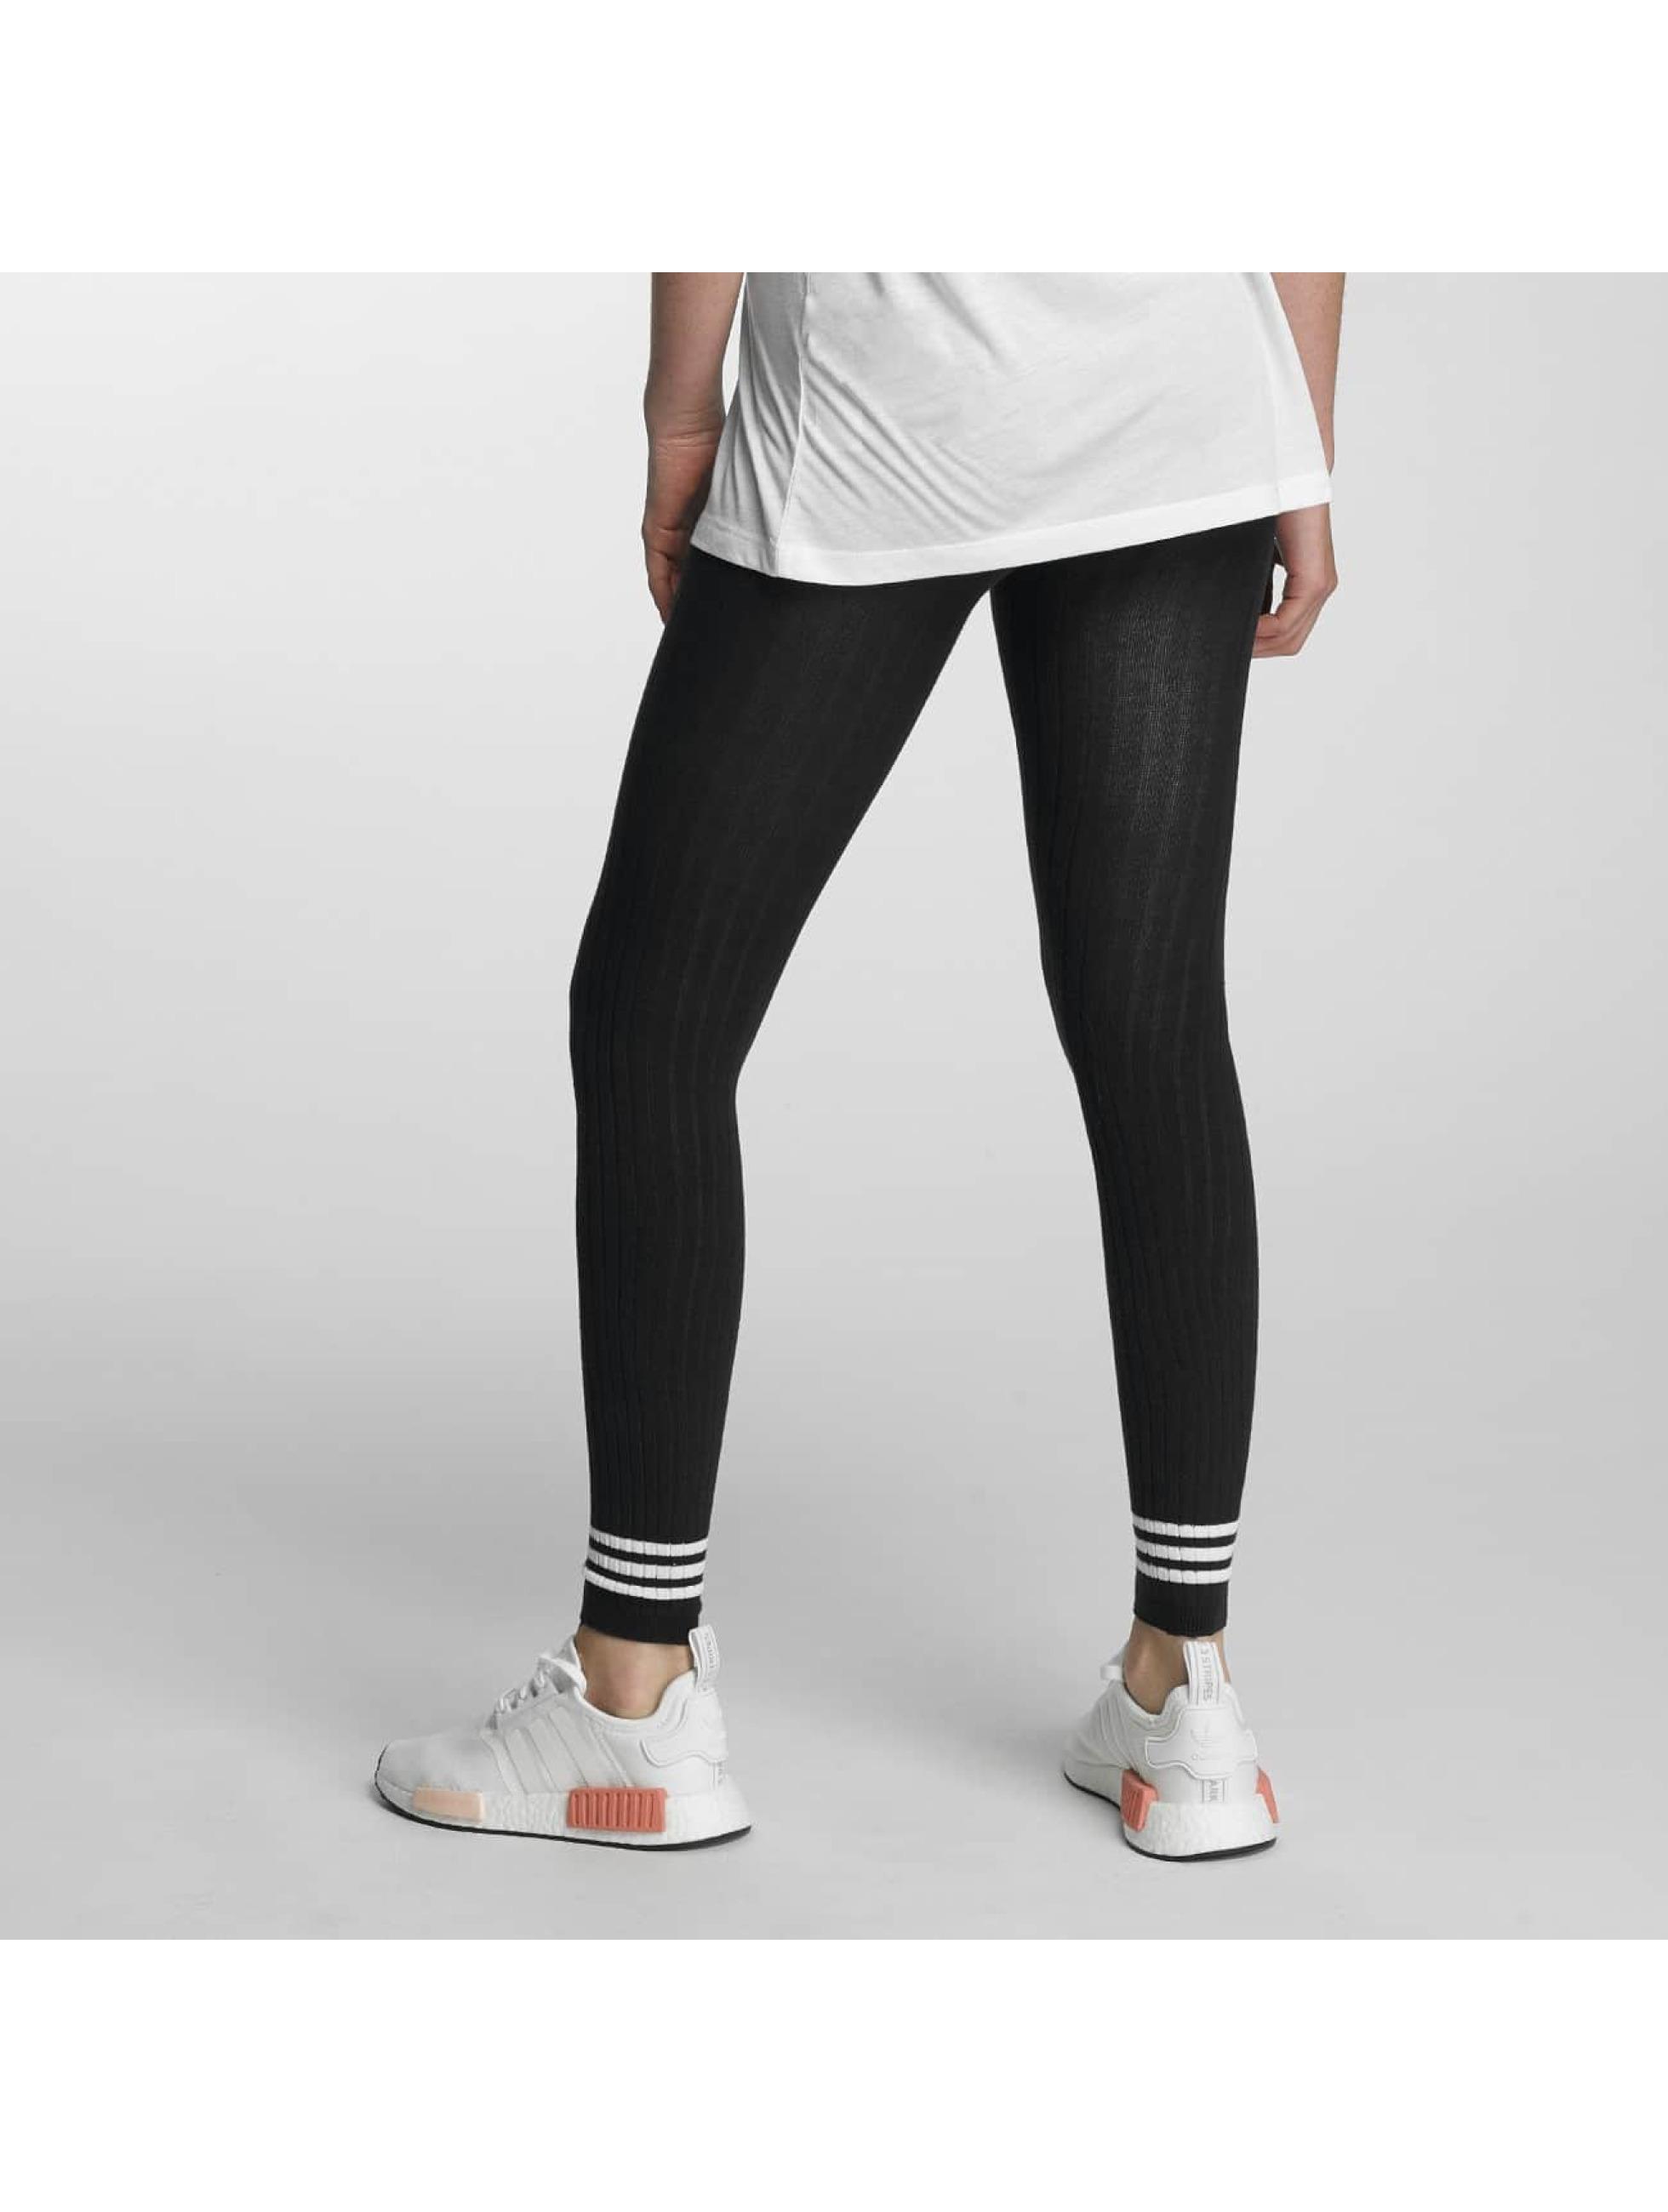 adidas originals Леггинсы 3 Stripes синий